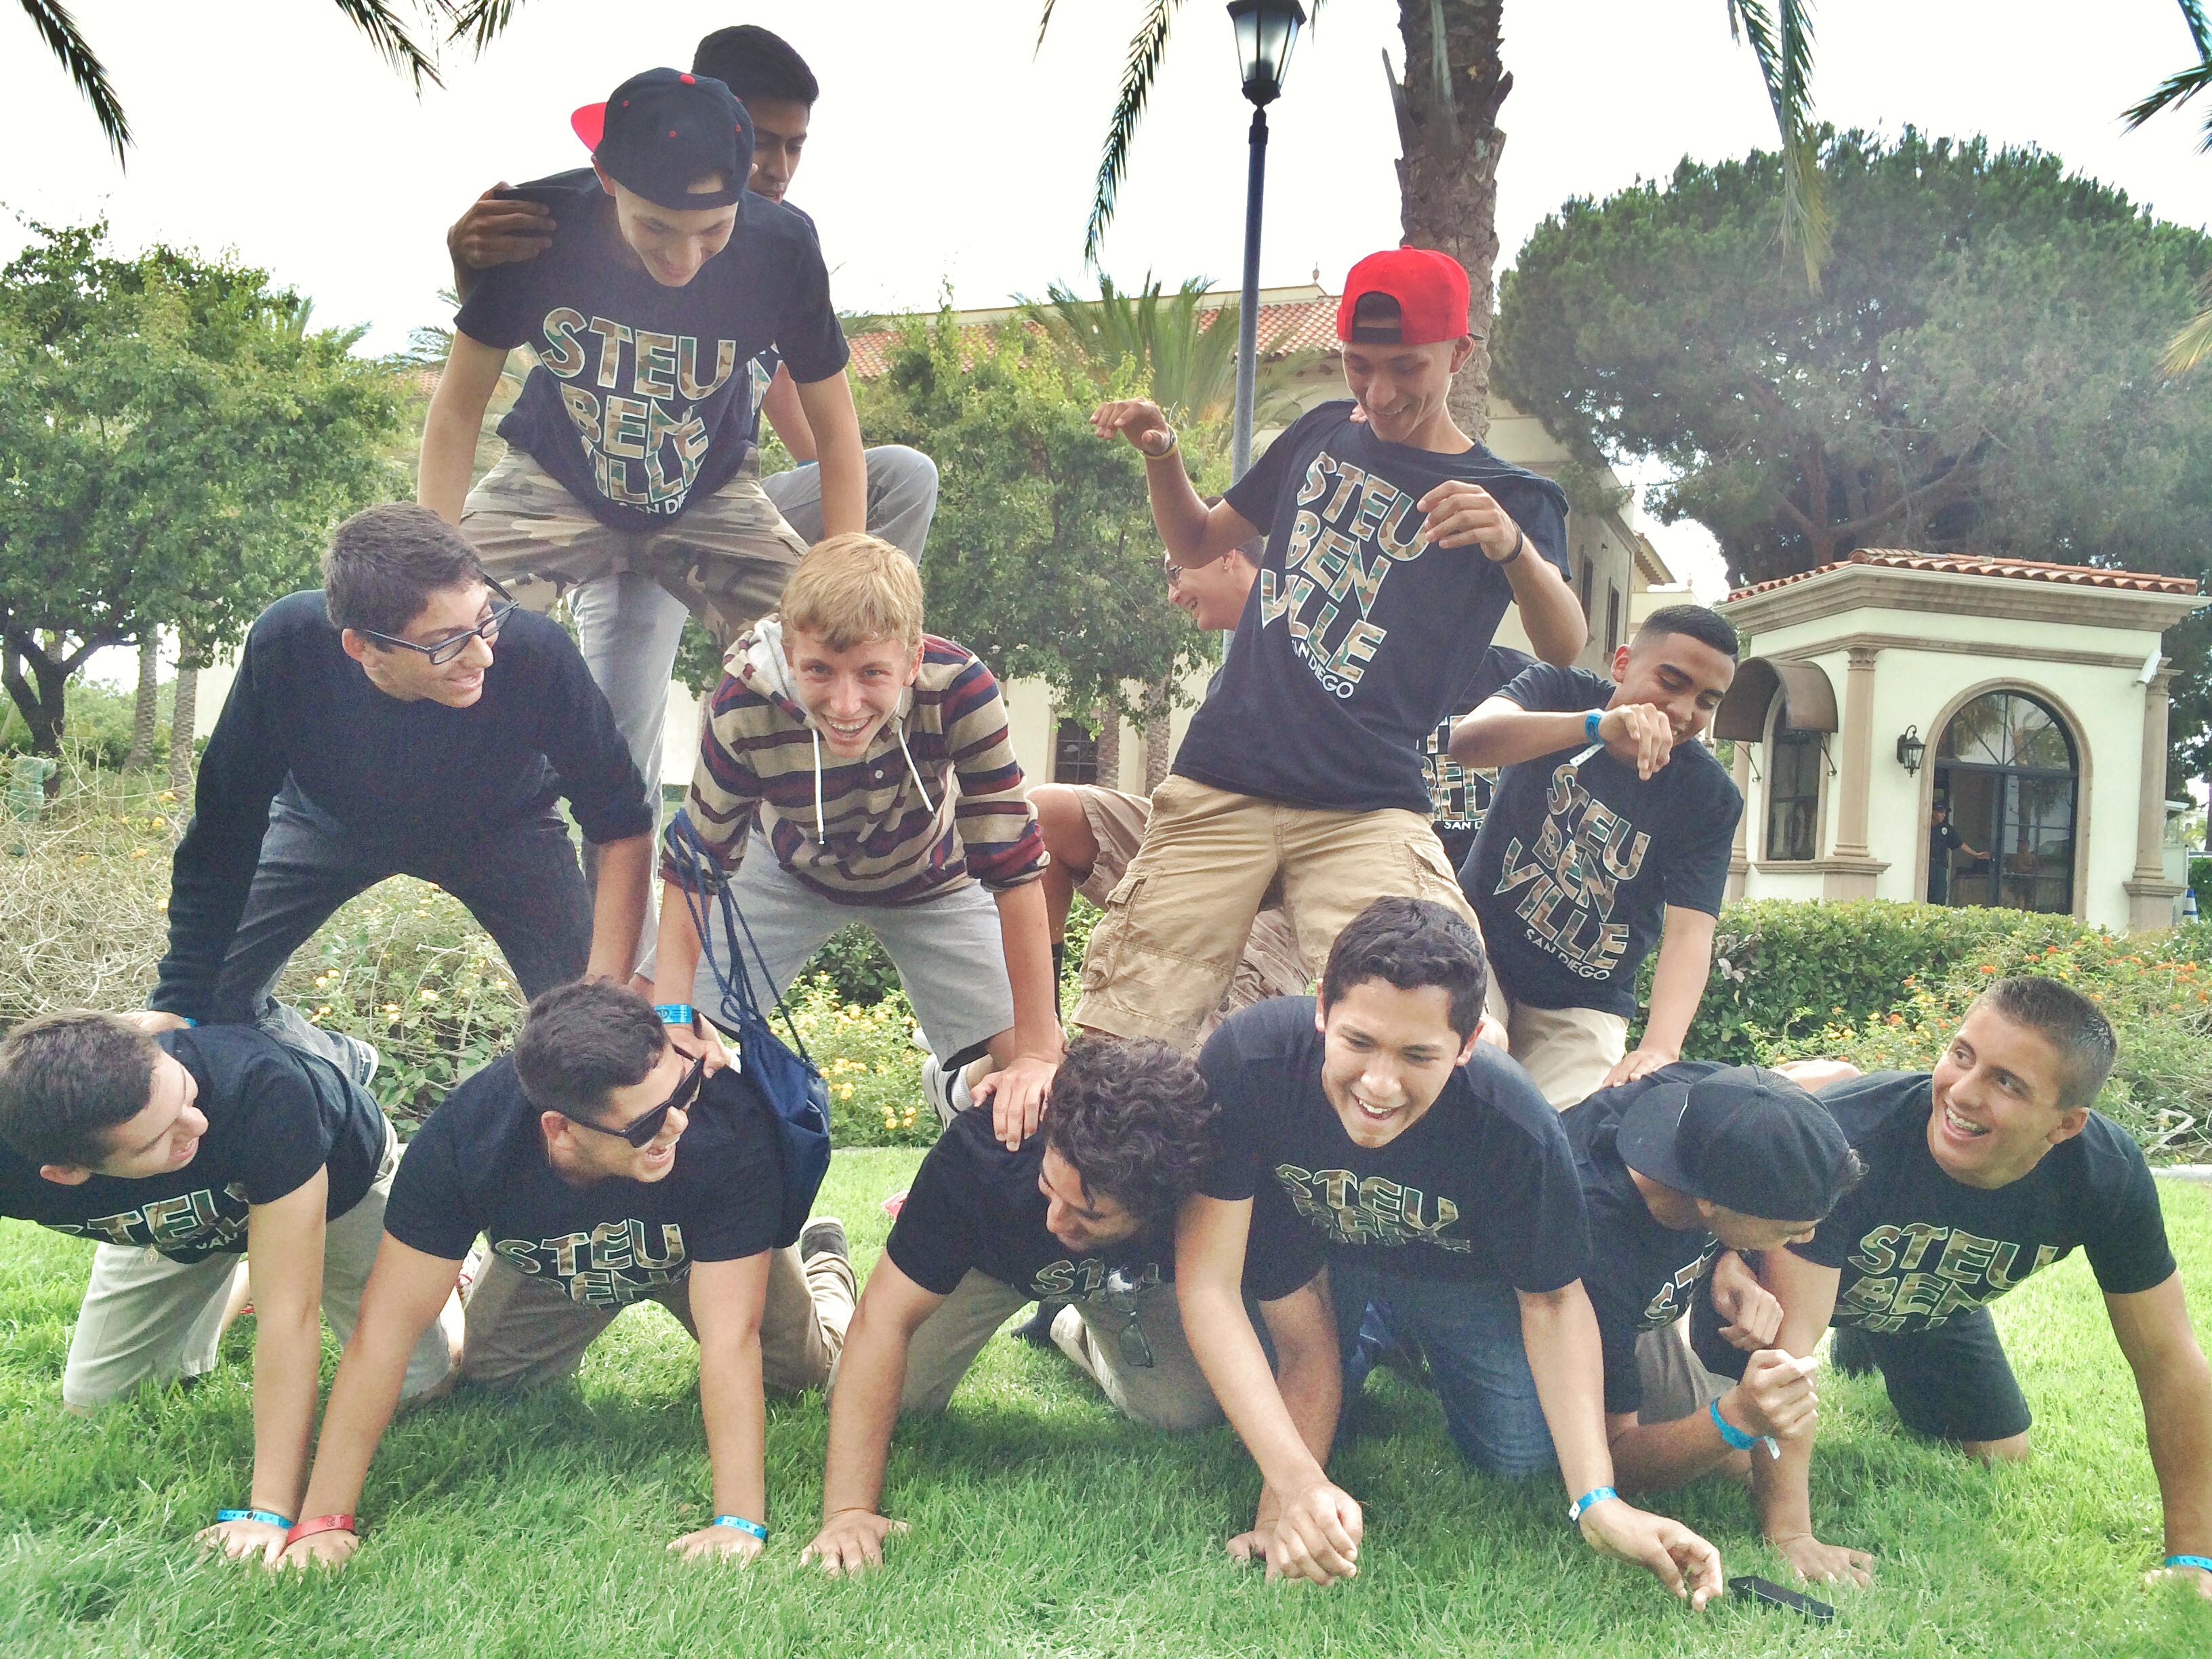 University of San Diego 2014